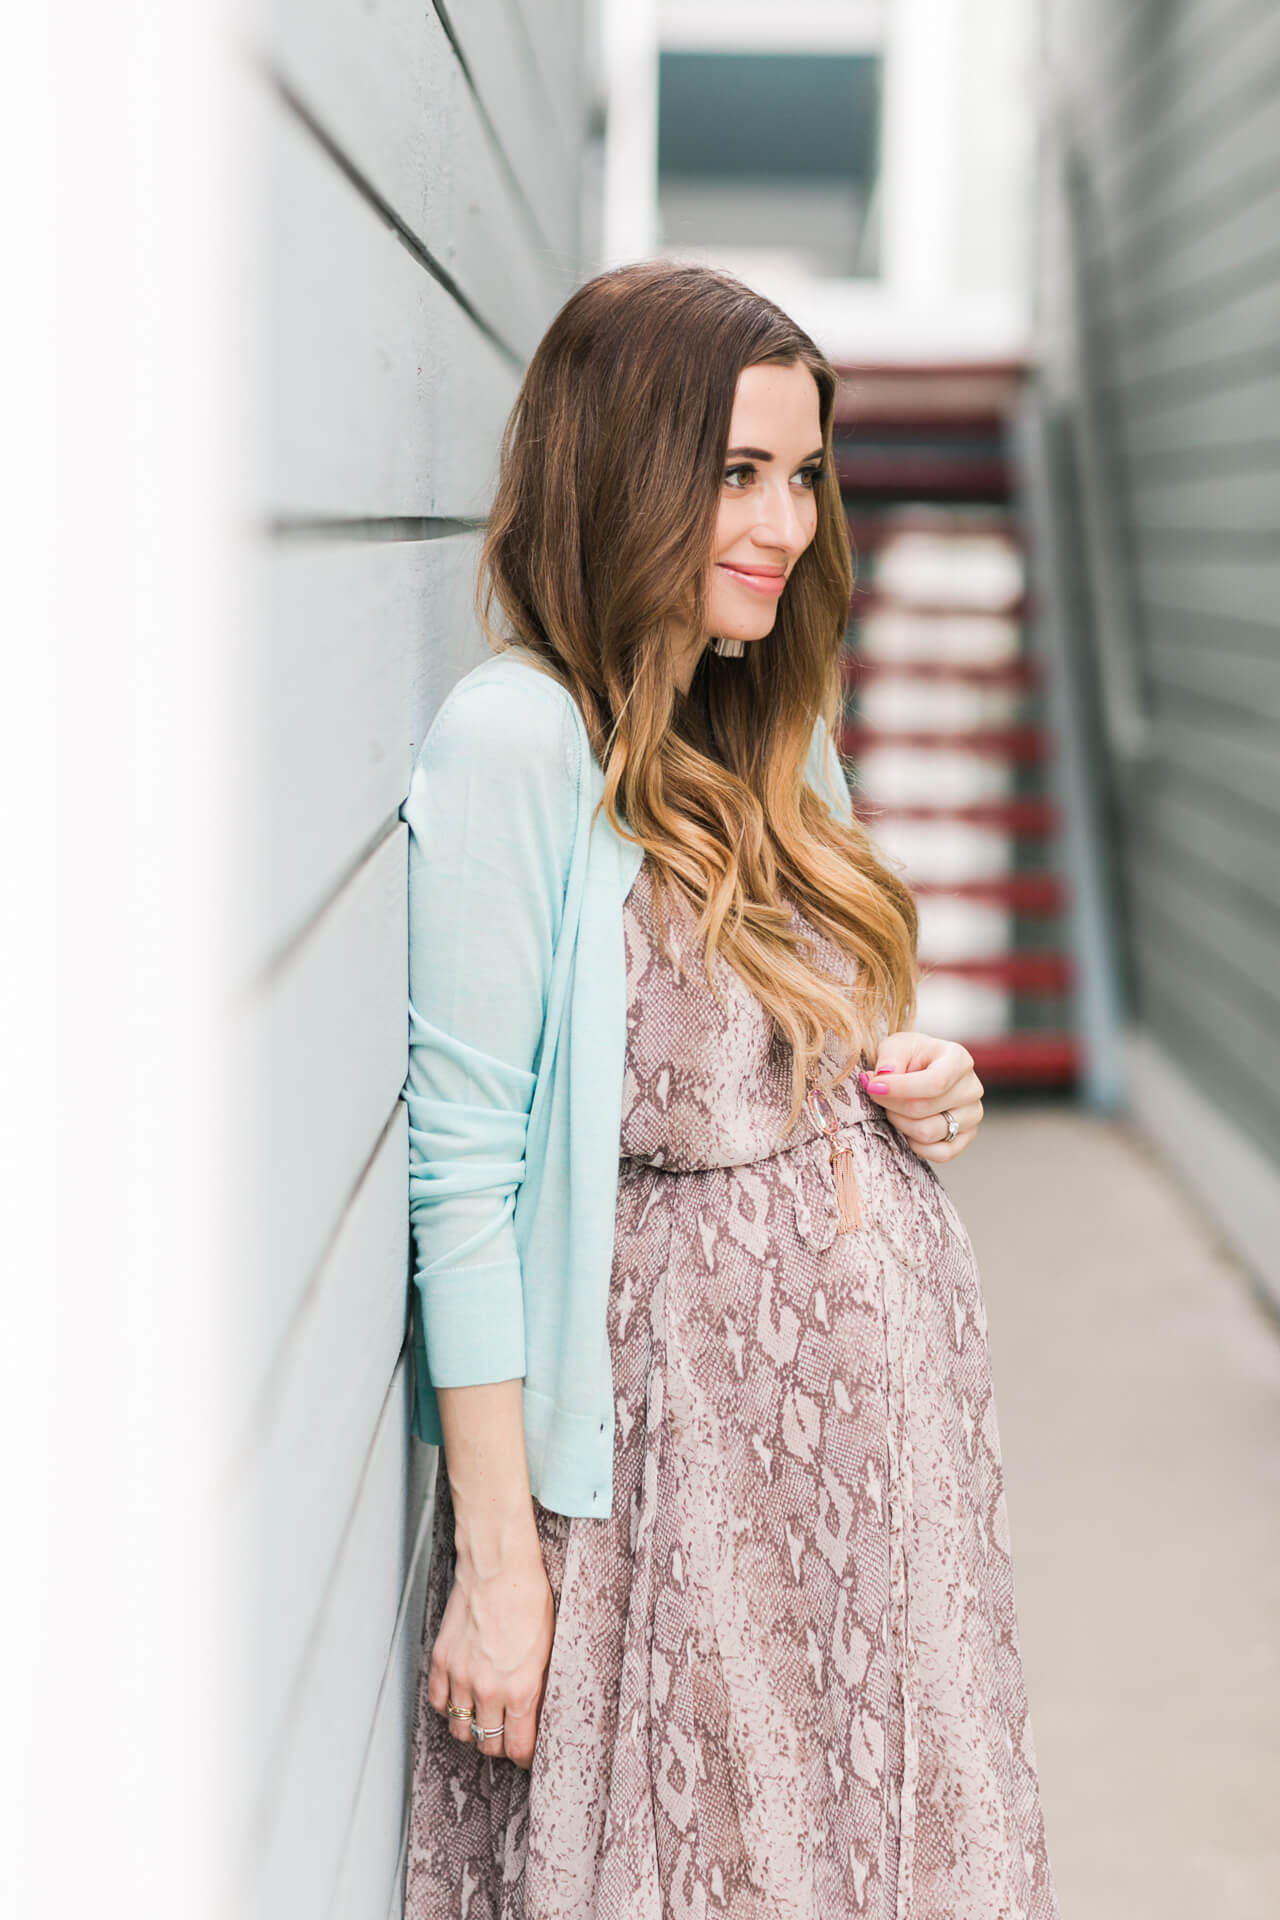 dressing the bump with an elastic waist dress